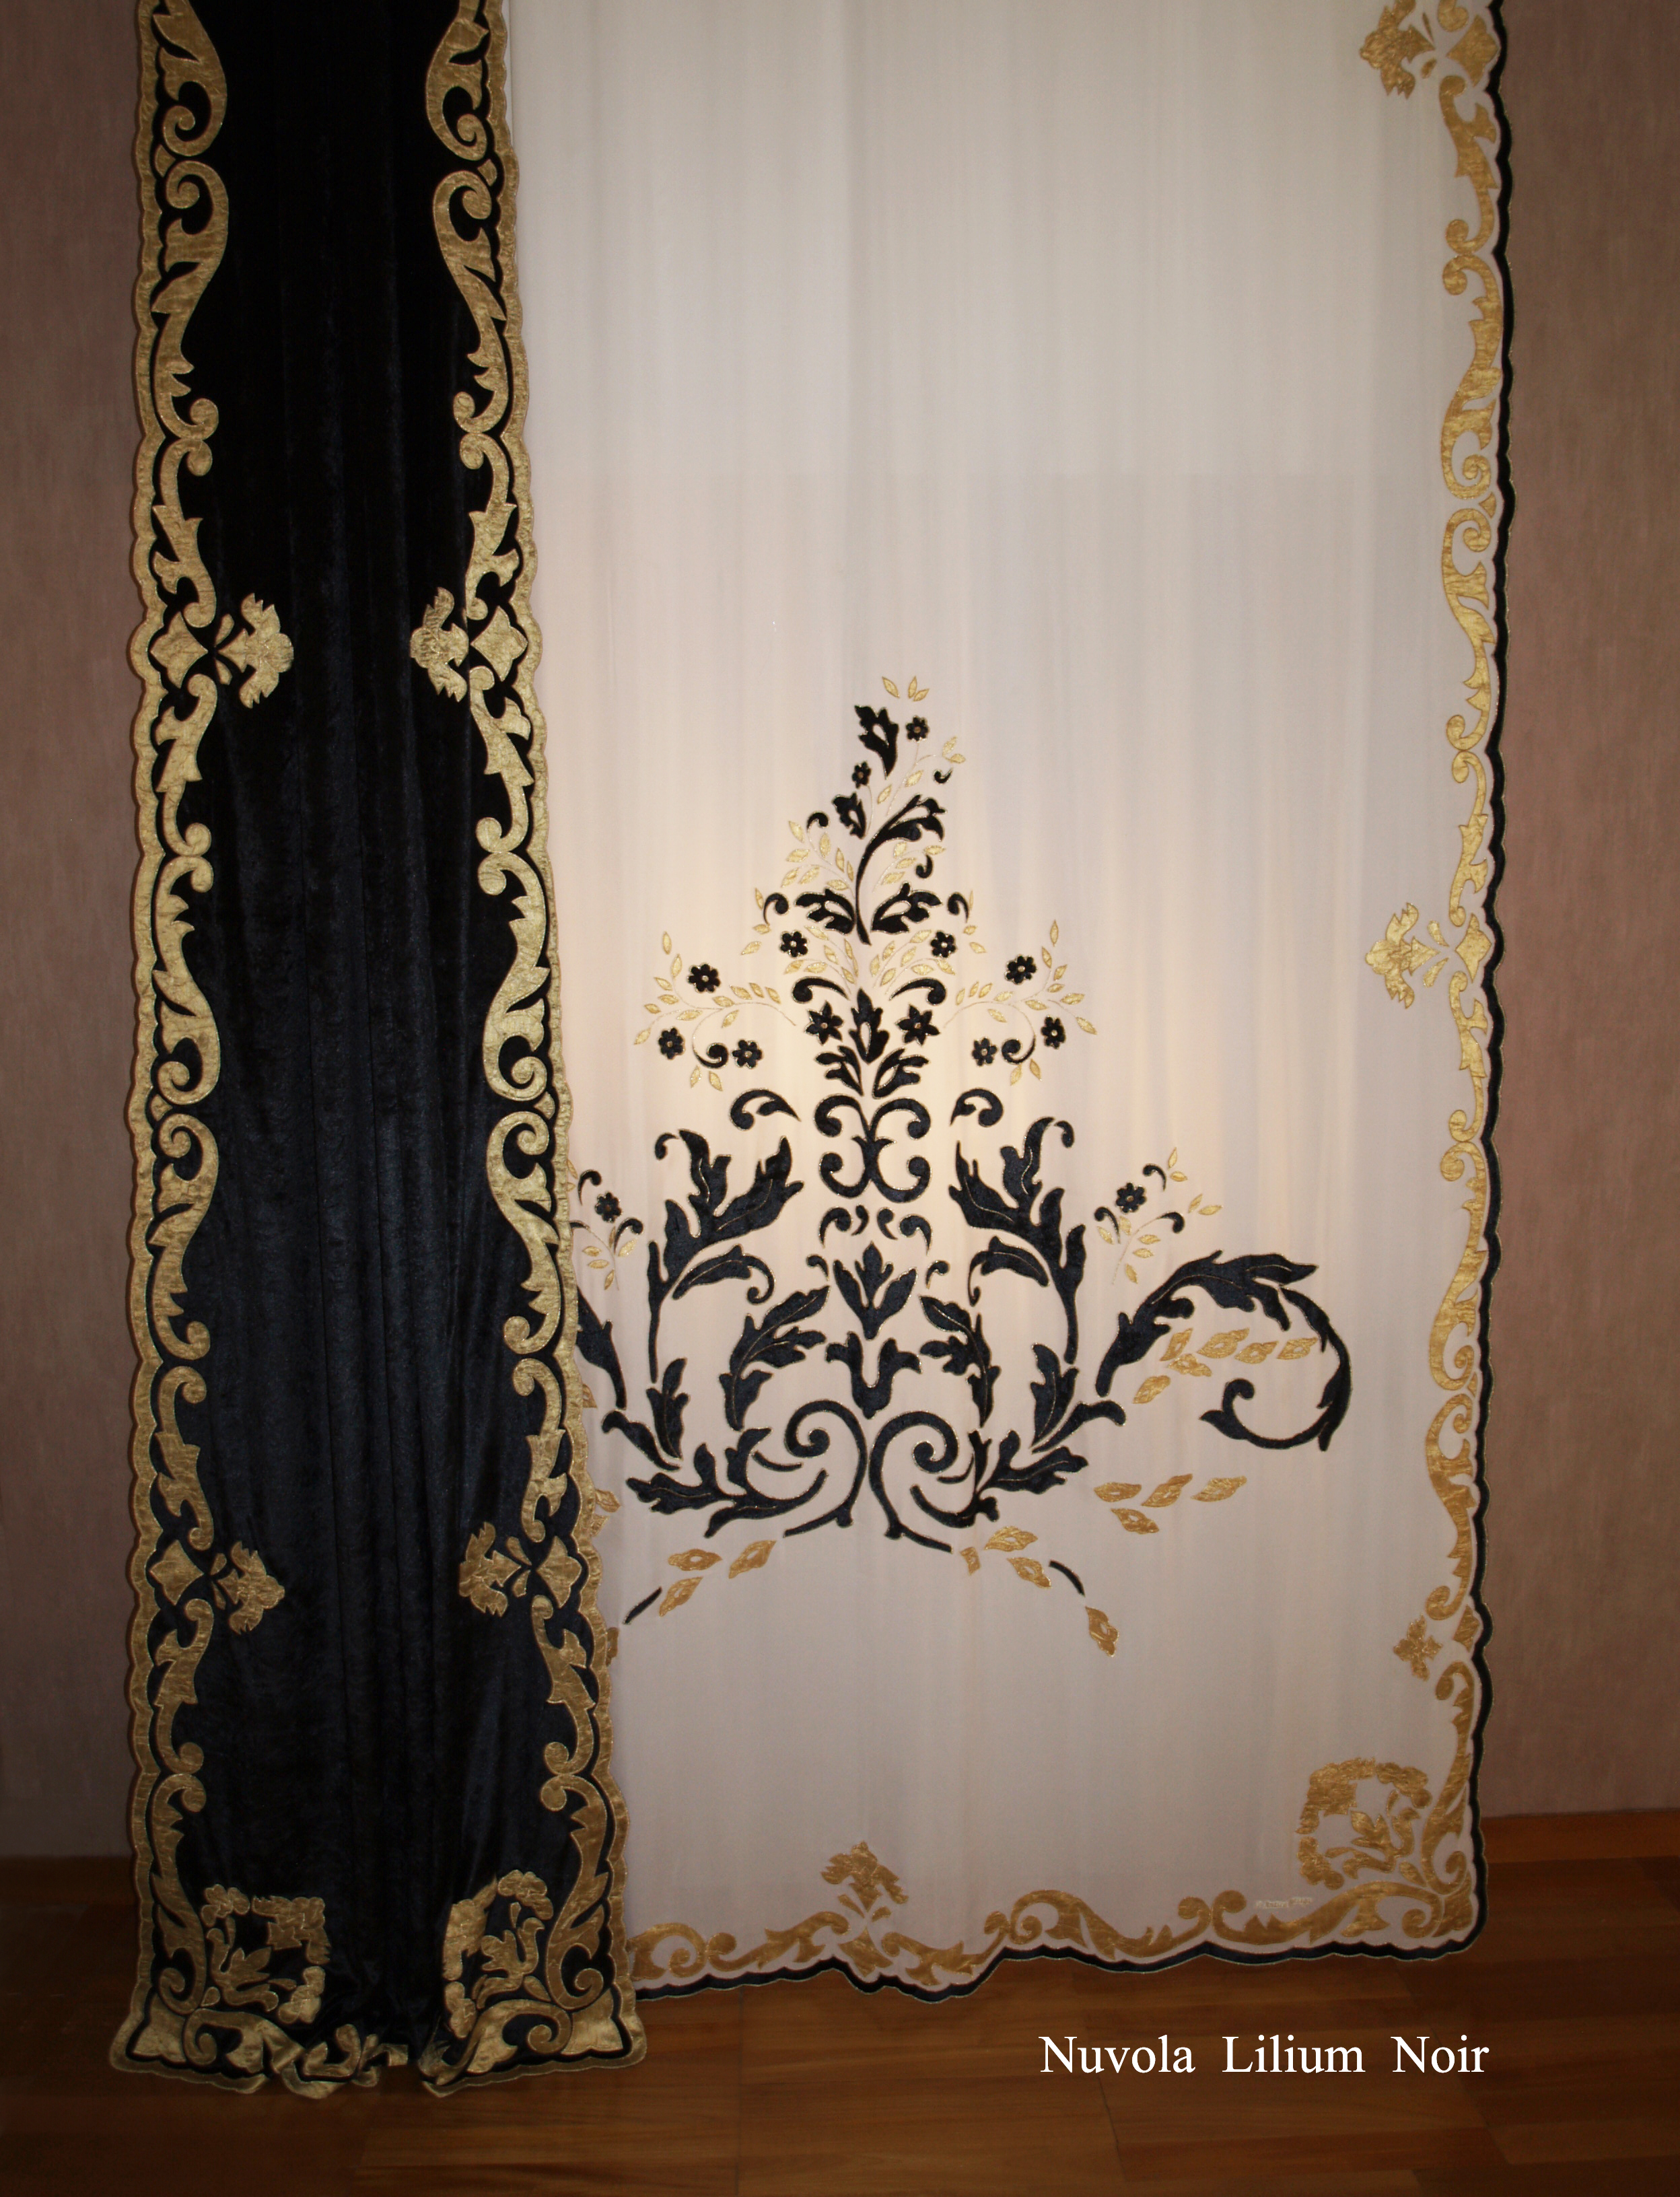 Nuvola Lilium georgette velvet Noir